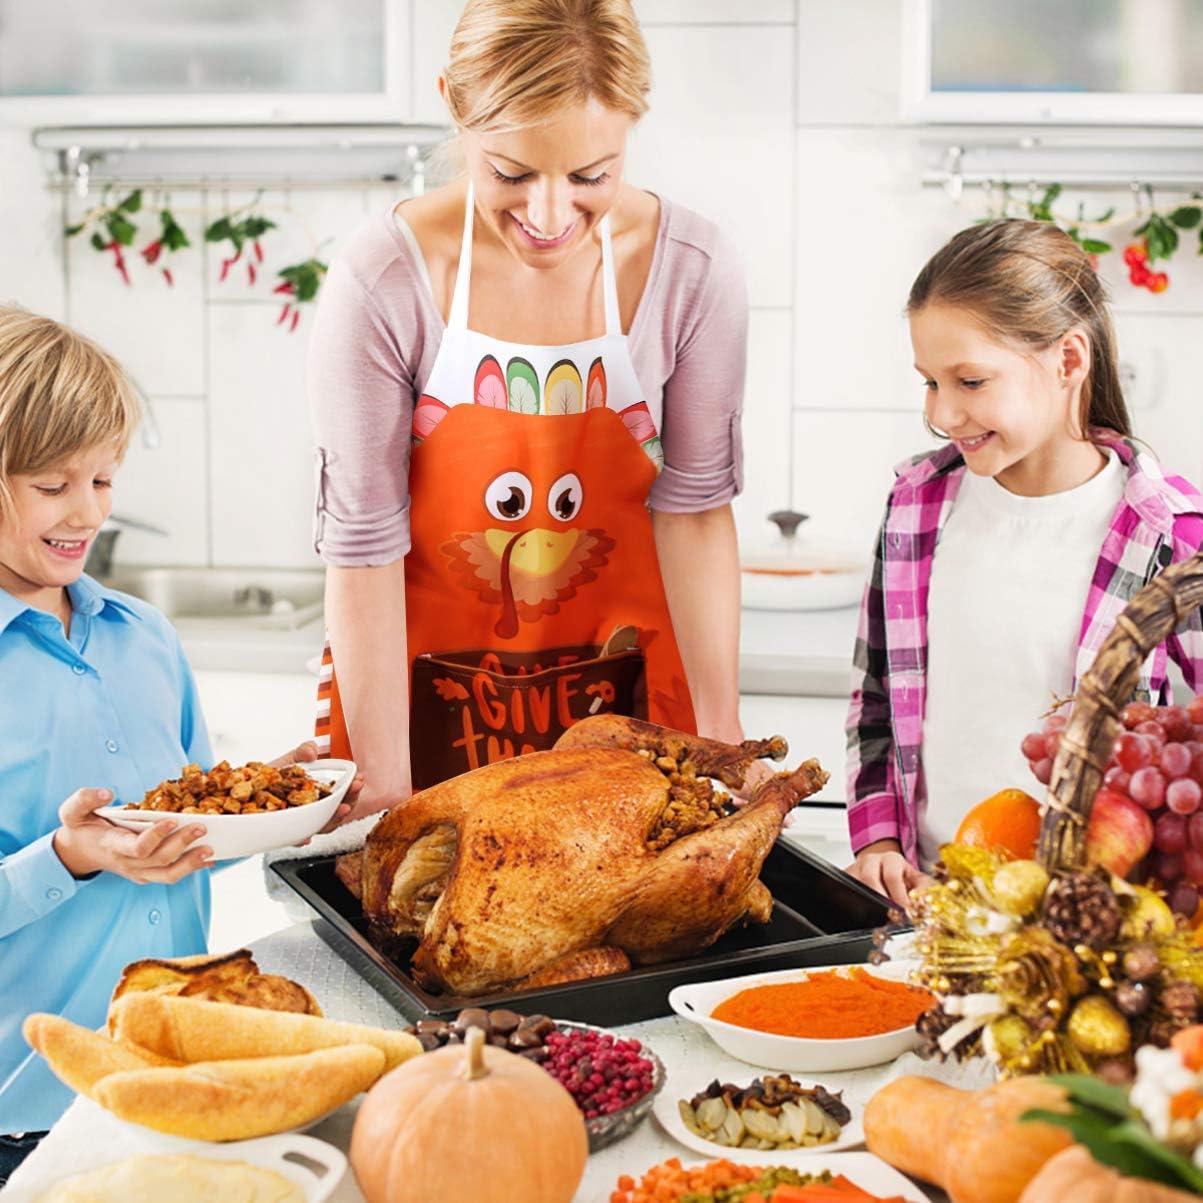 Cooking Apron Thanksgiving Day Kitchen Turkey Apron Waterproof Thanksgiving Day Cooking Supplies